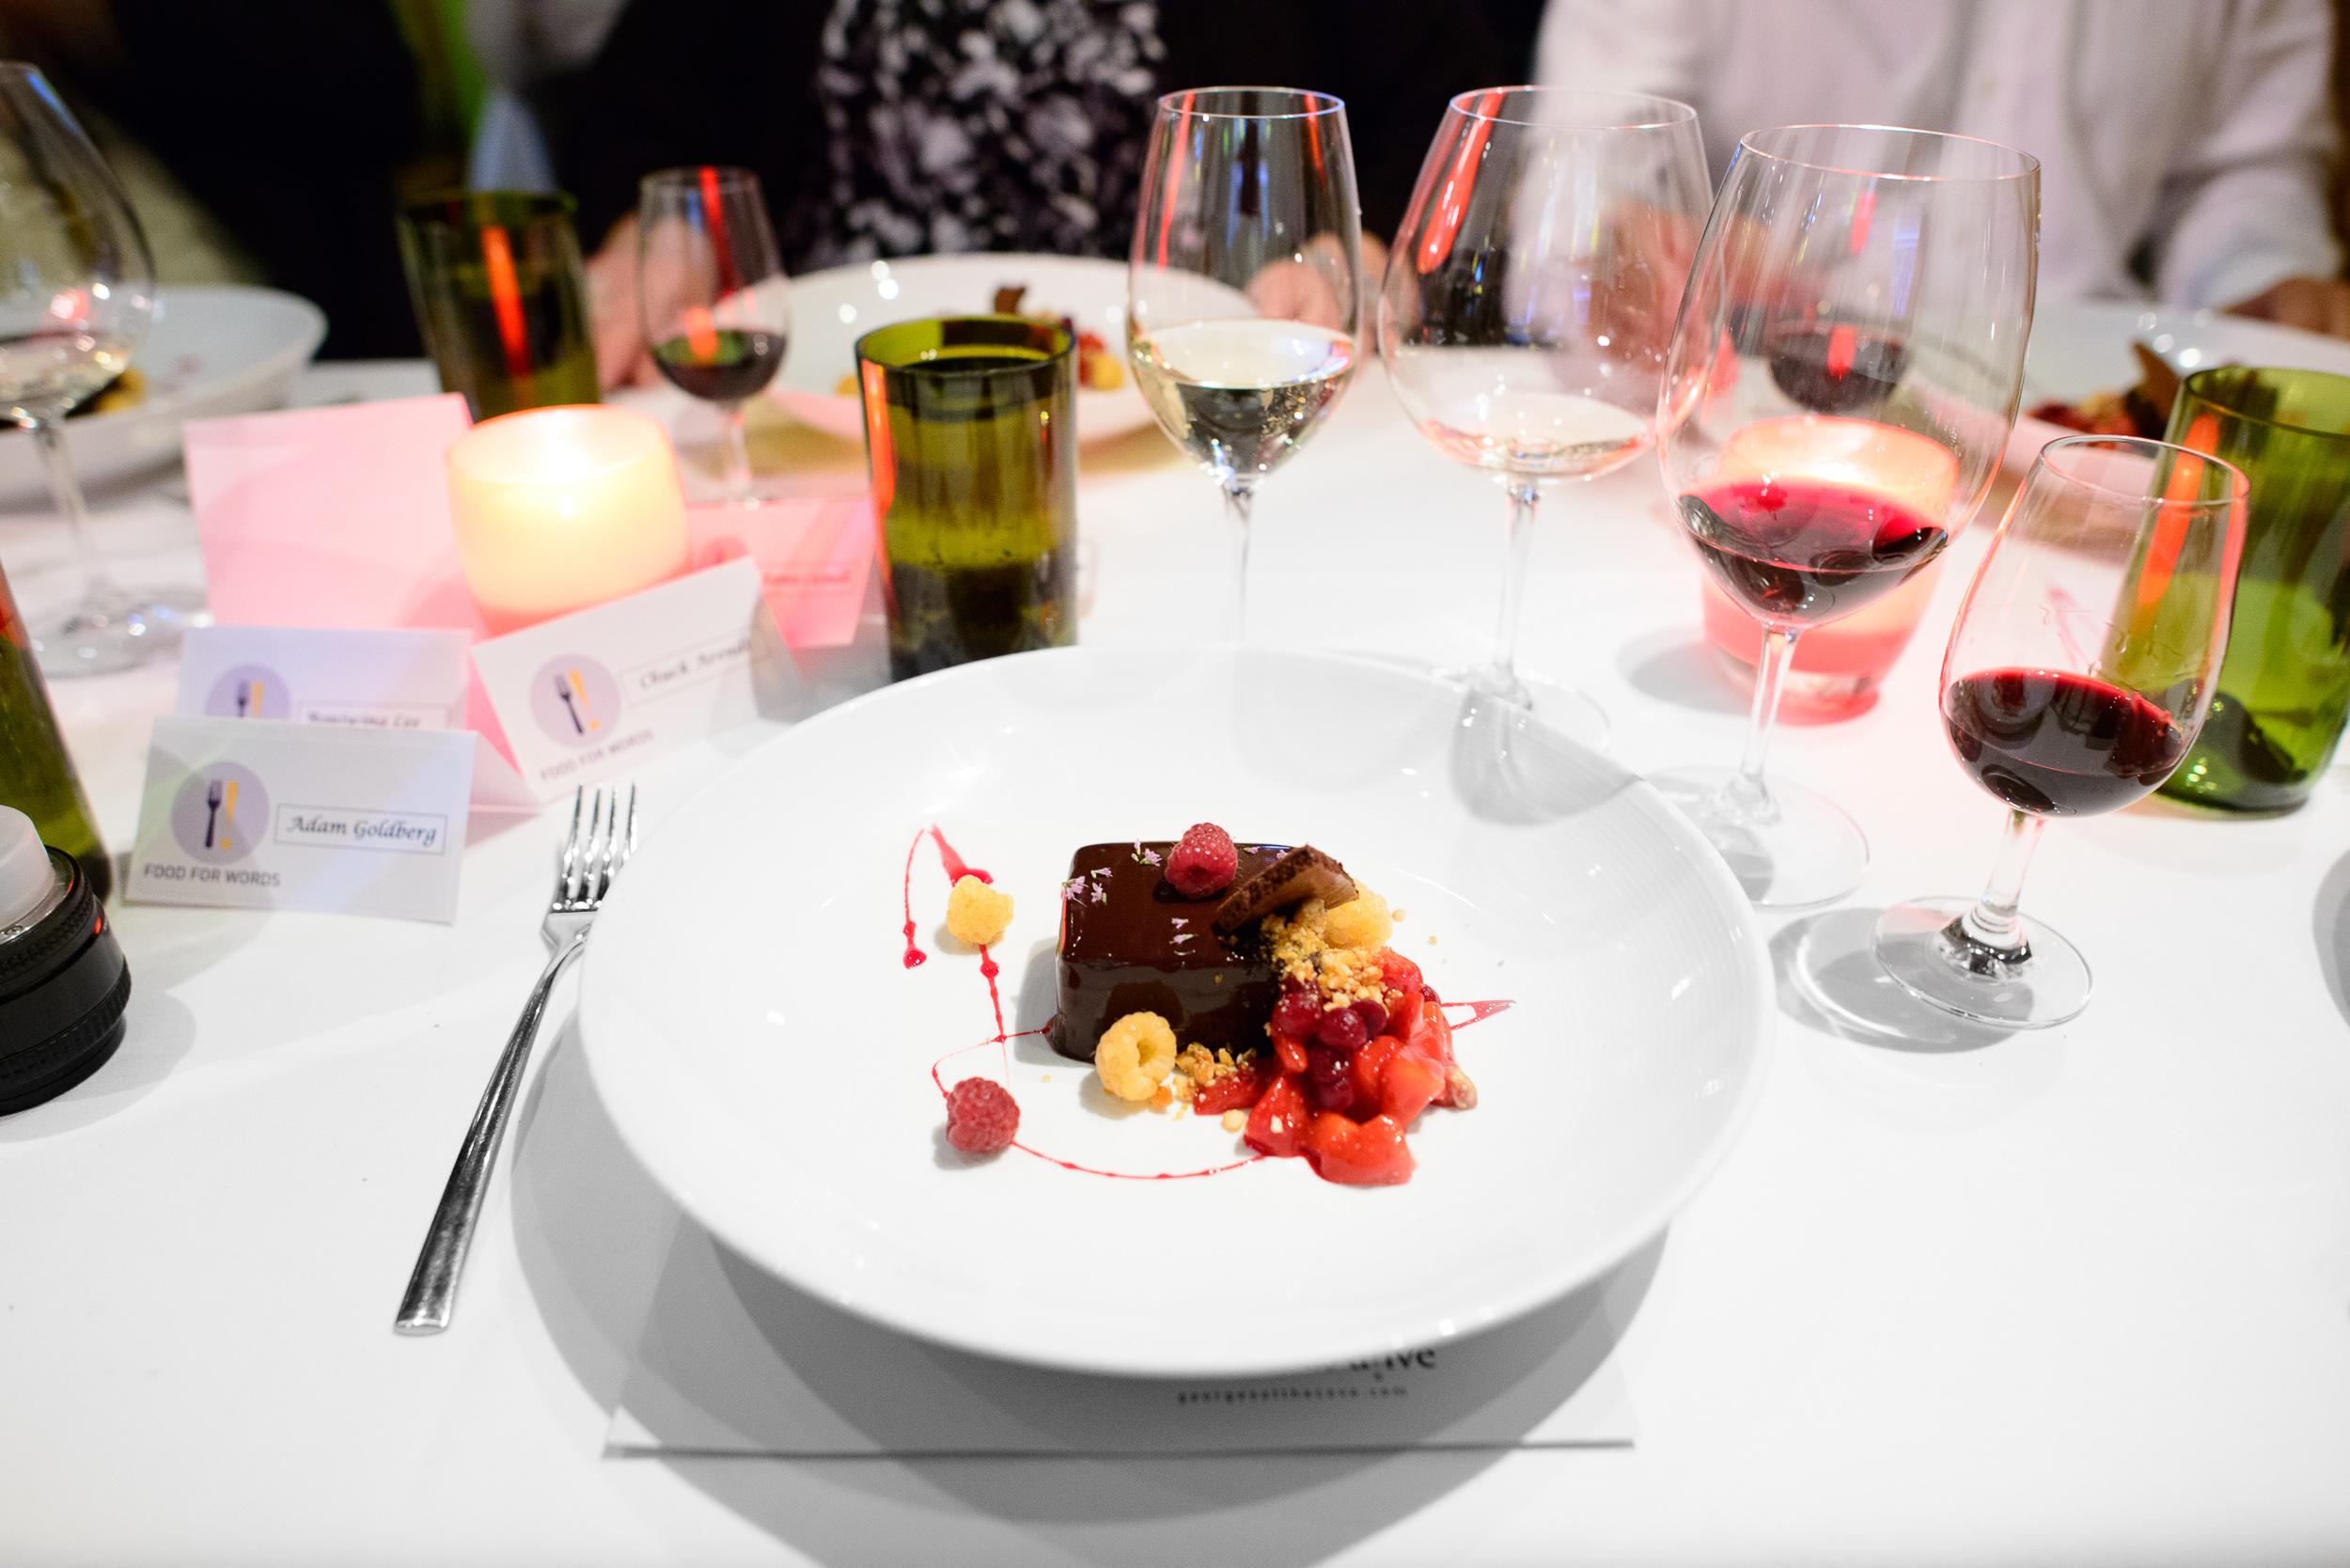 7th Course: Chocolate, beets, strawberries, raspberries, hazelnu